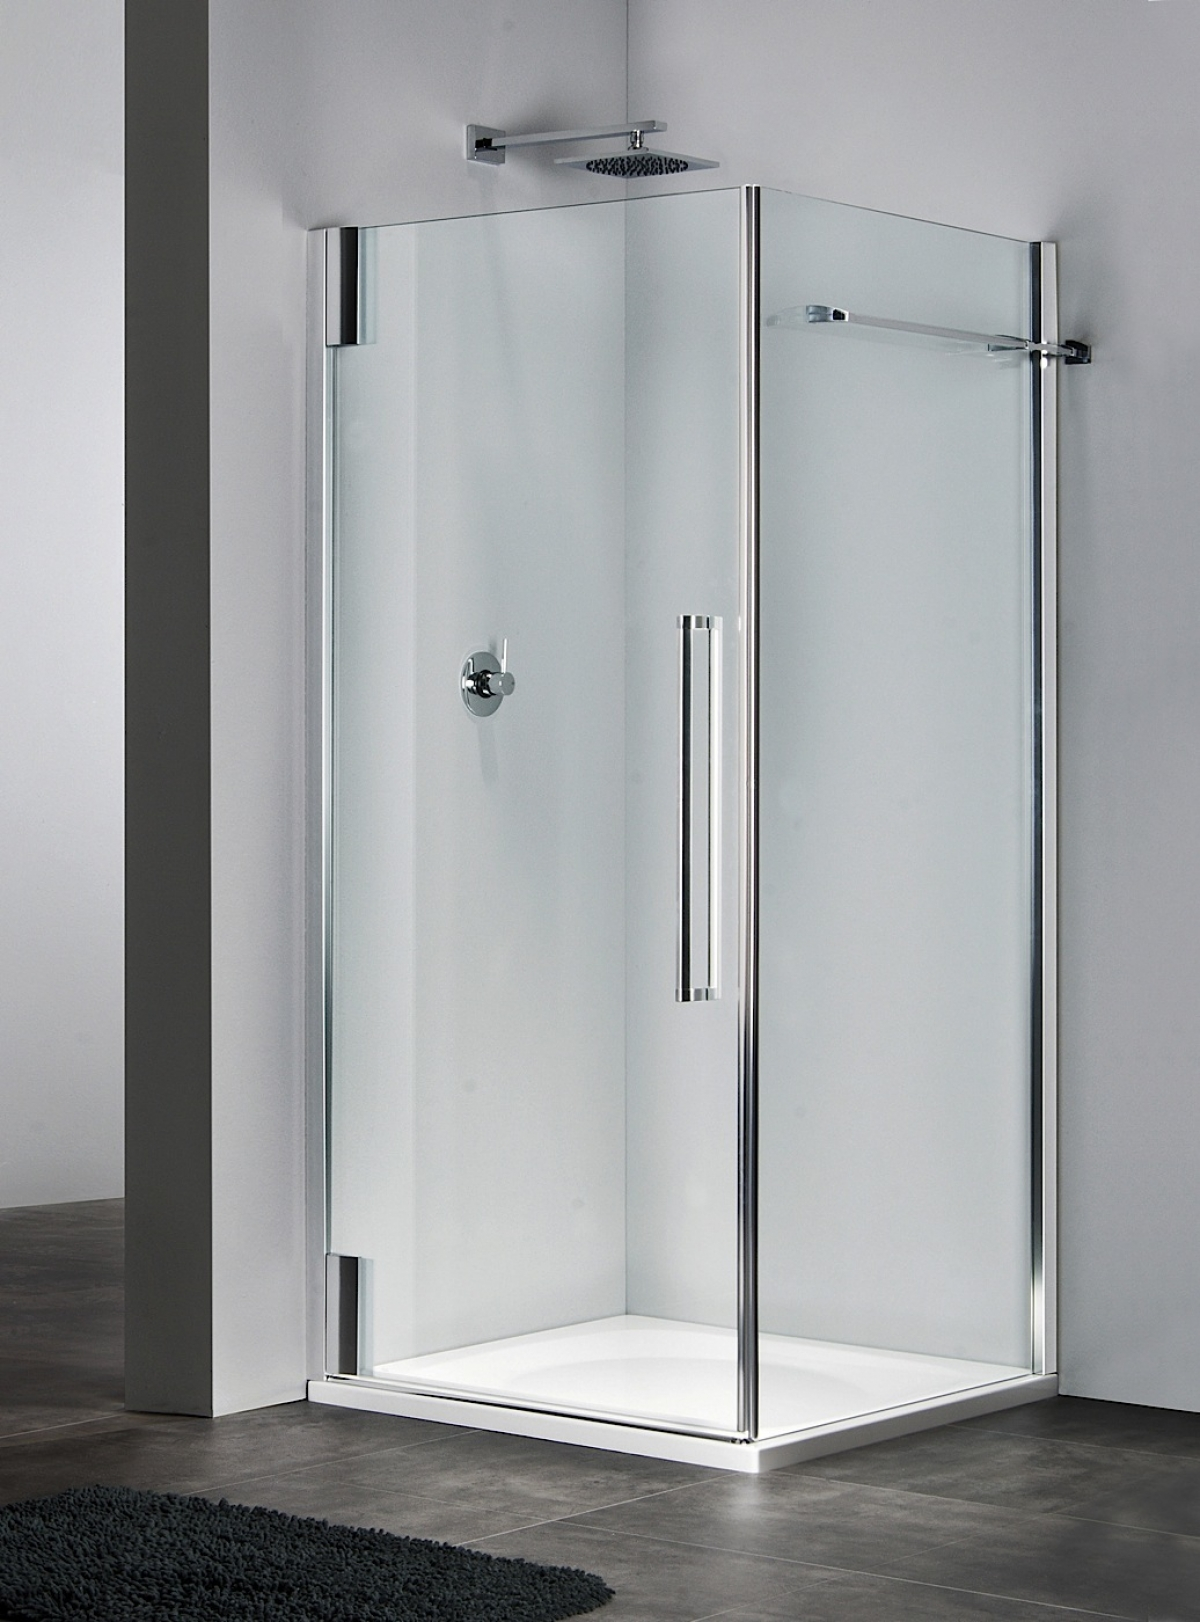 Beltrame forniture idro termo sanitarie arredo - Barili arredo bagno ...